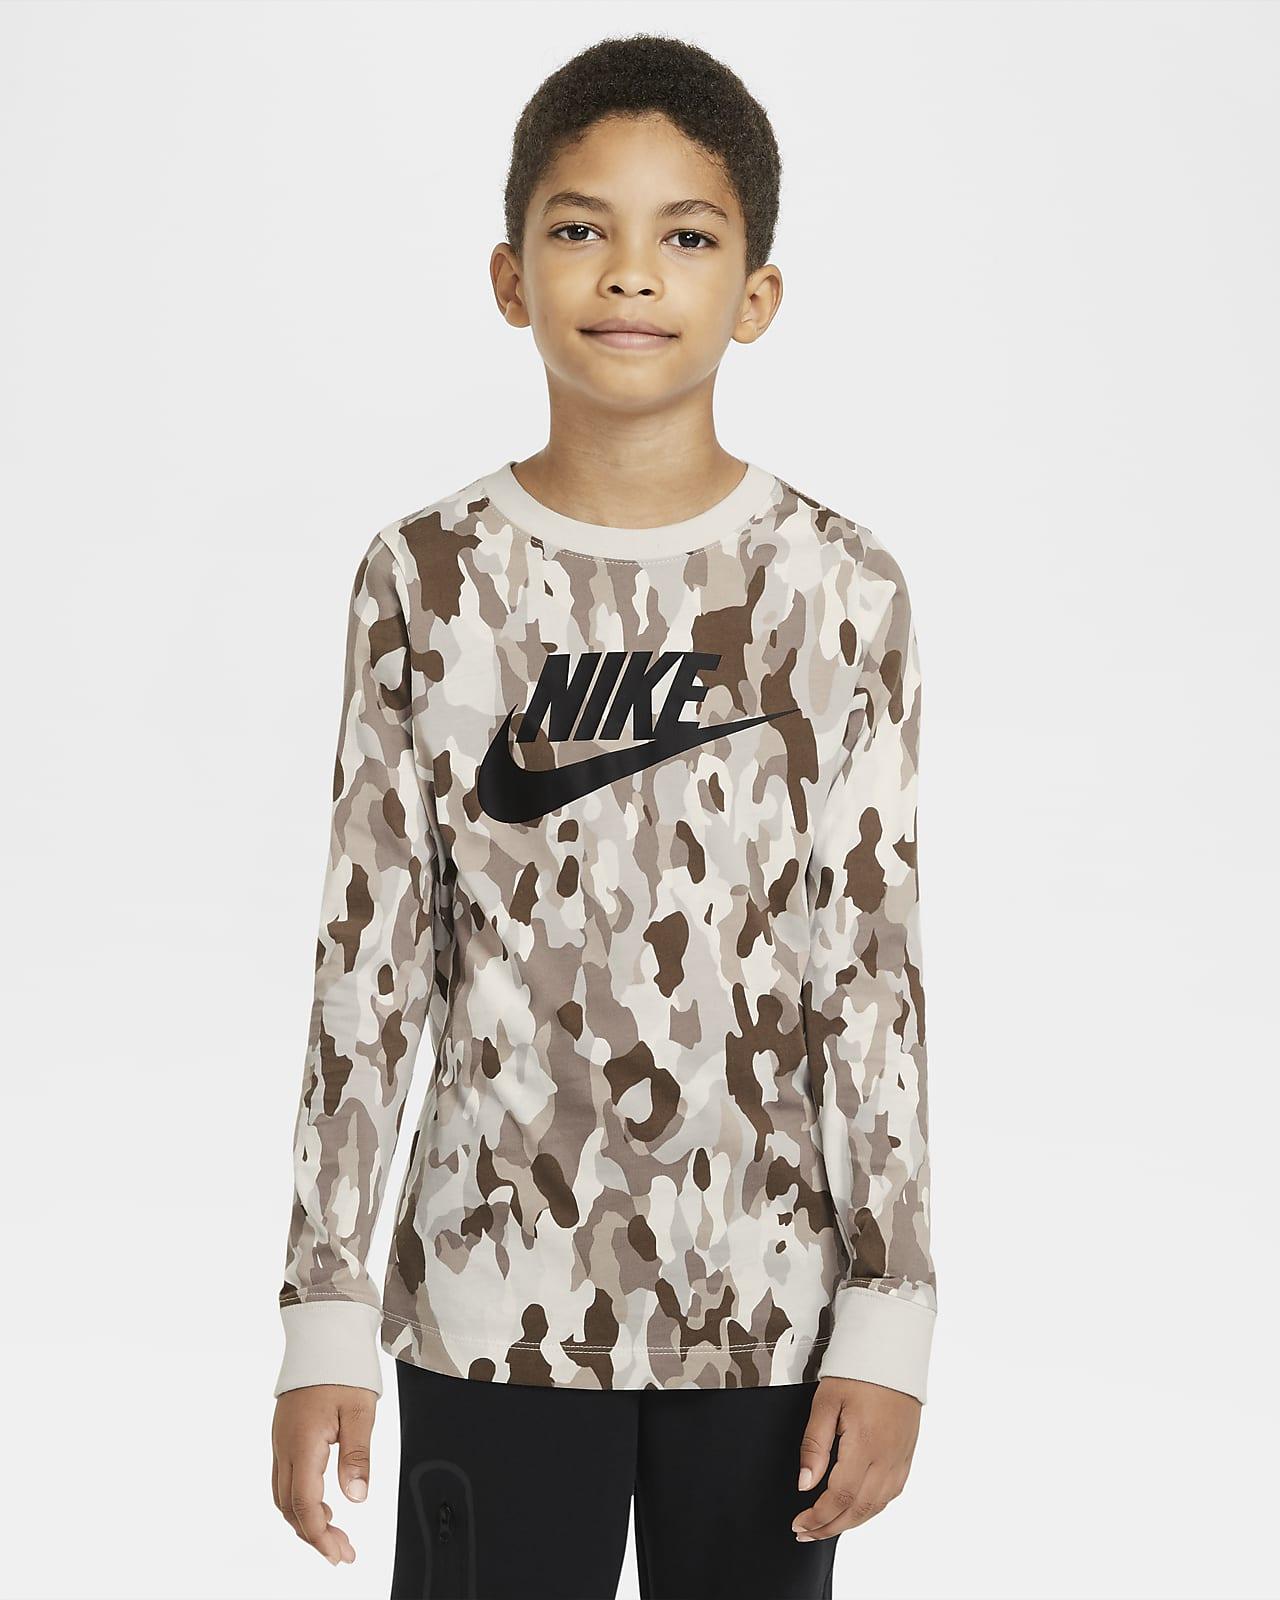 Camisola de manga comprida estampada Nike Sportswear Júnior (Rapaz)